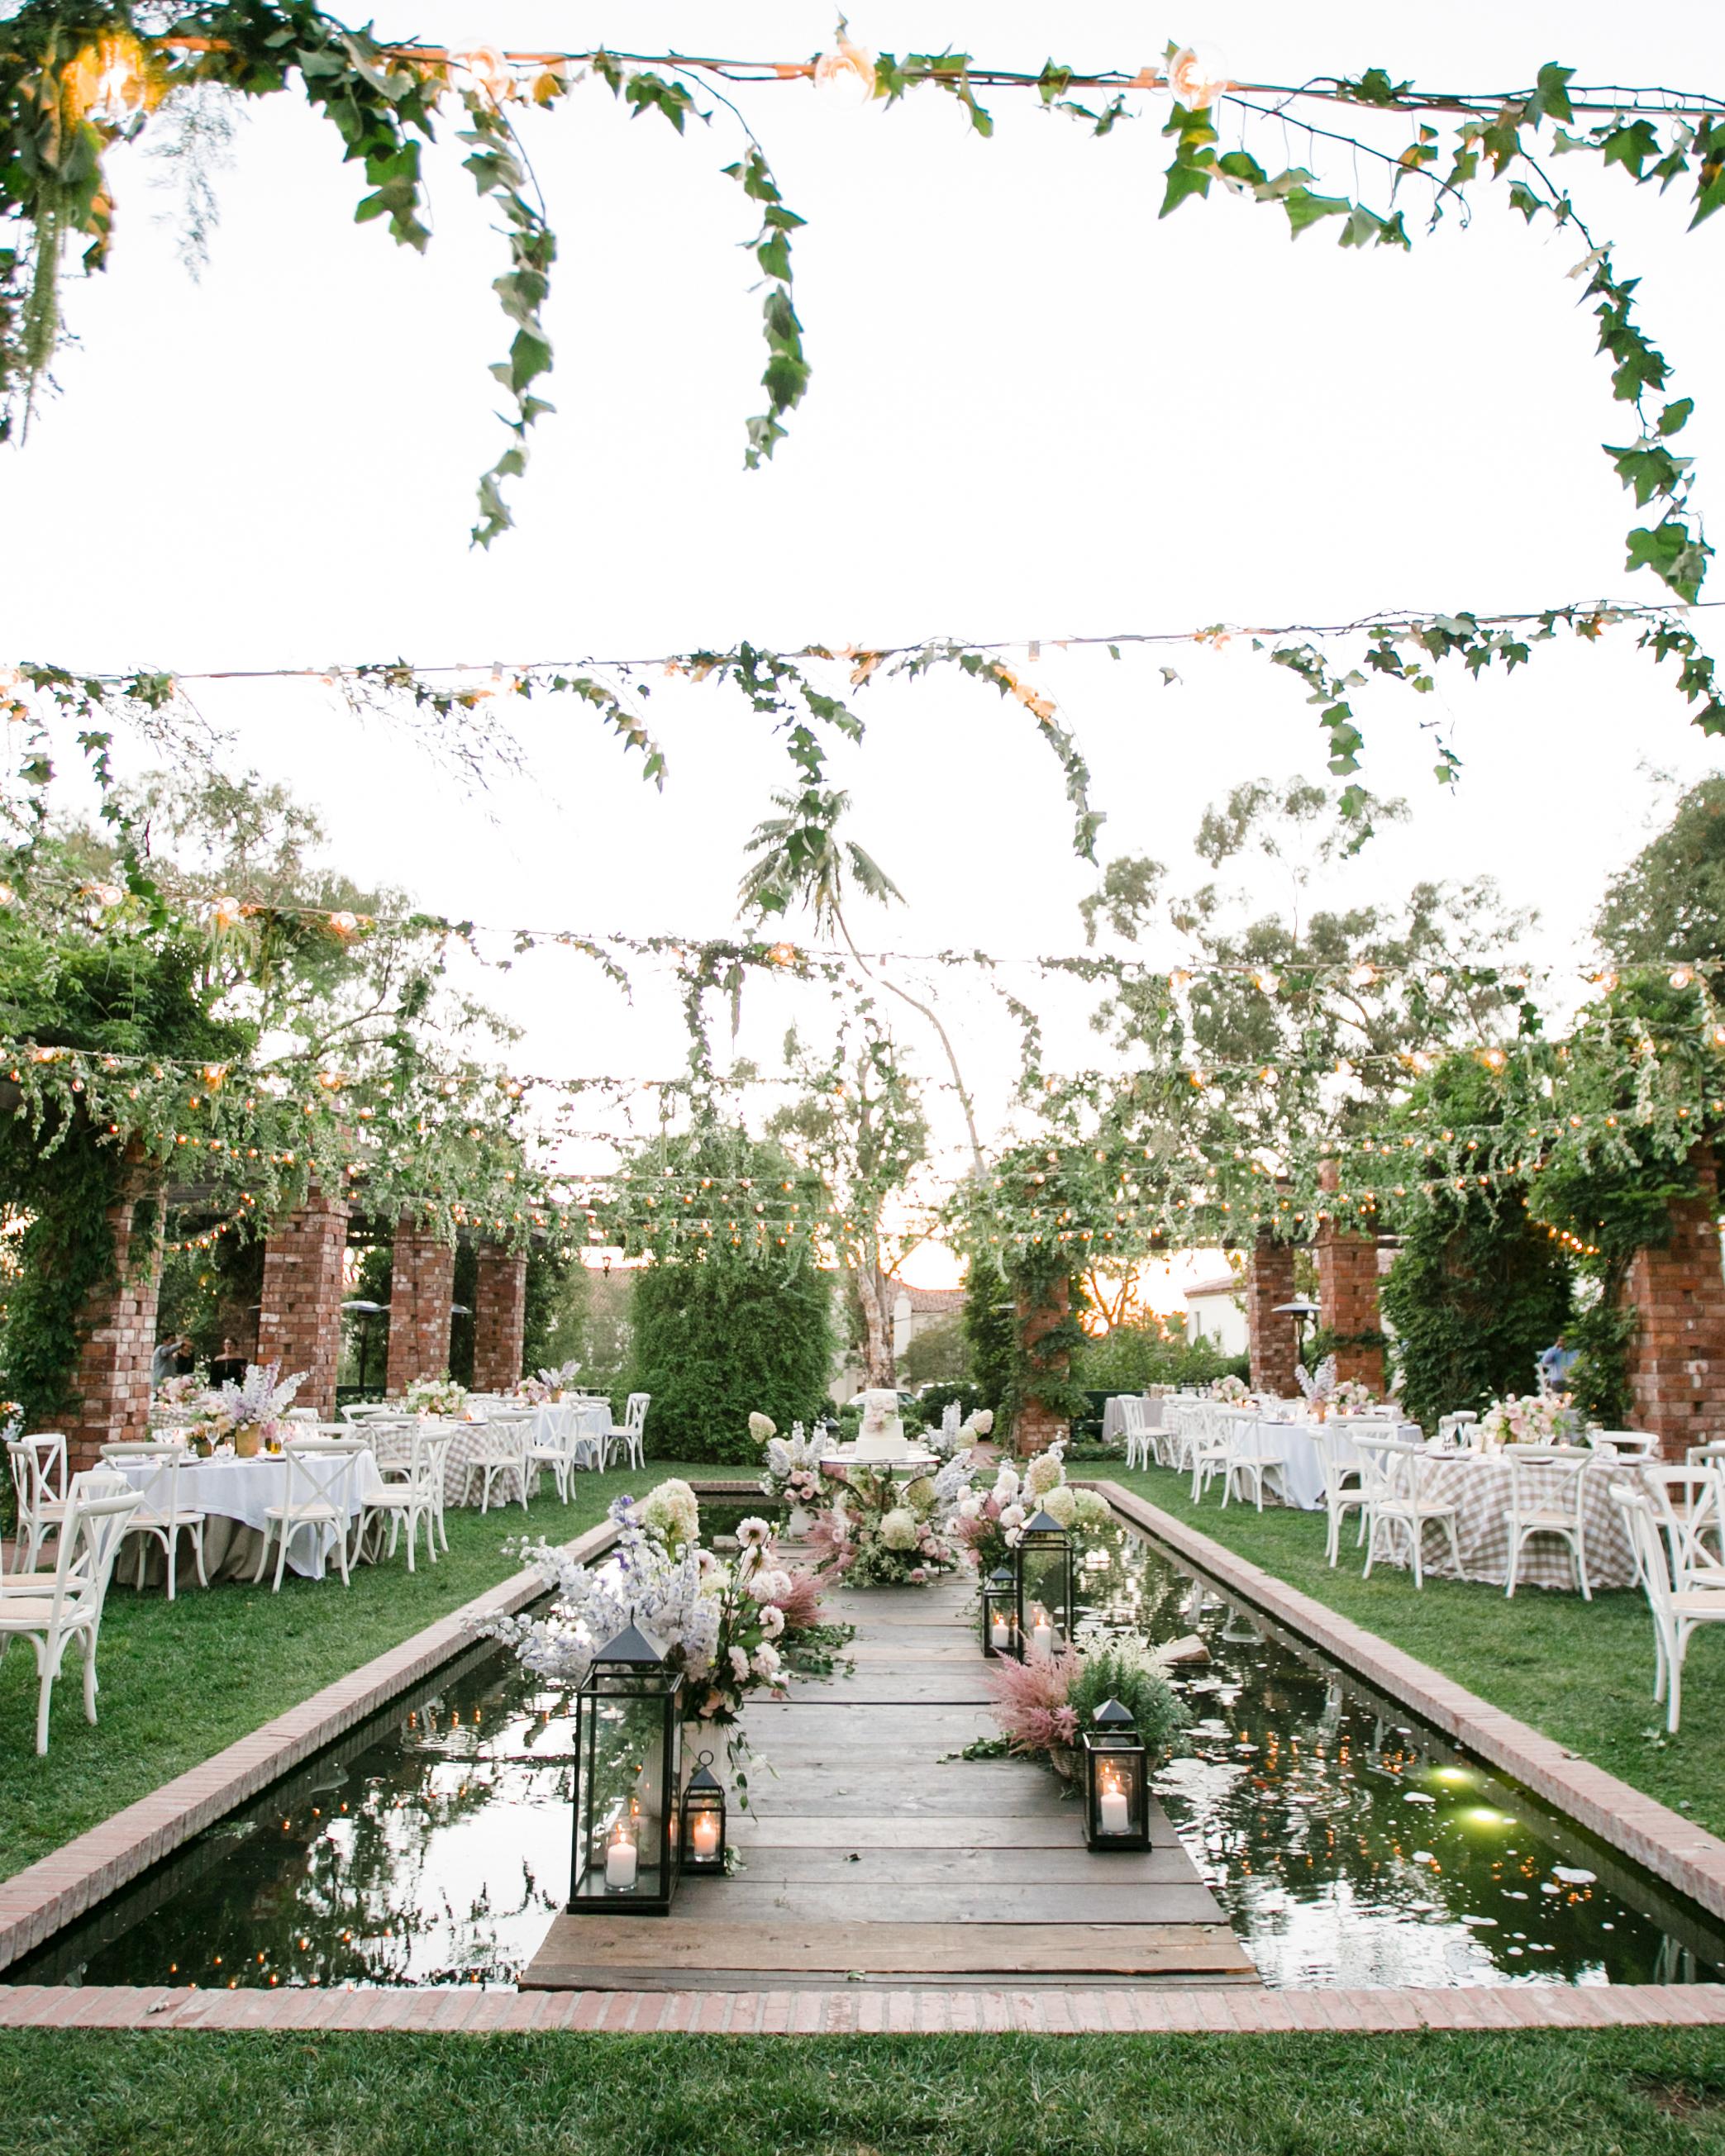 katy michael wedding reception space